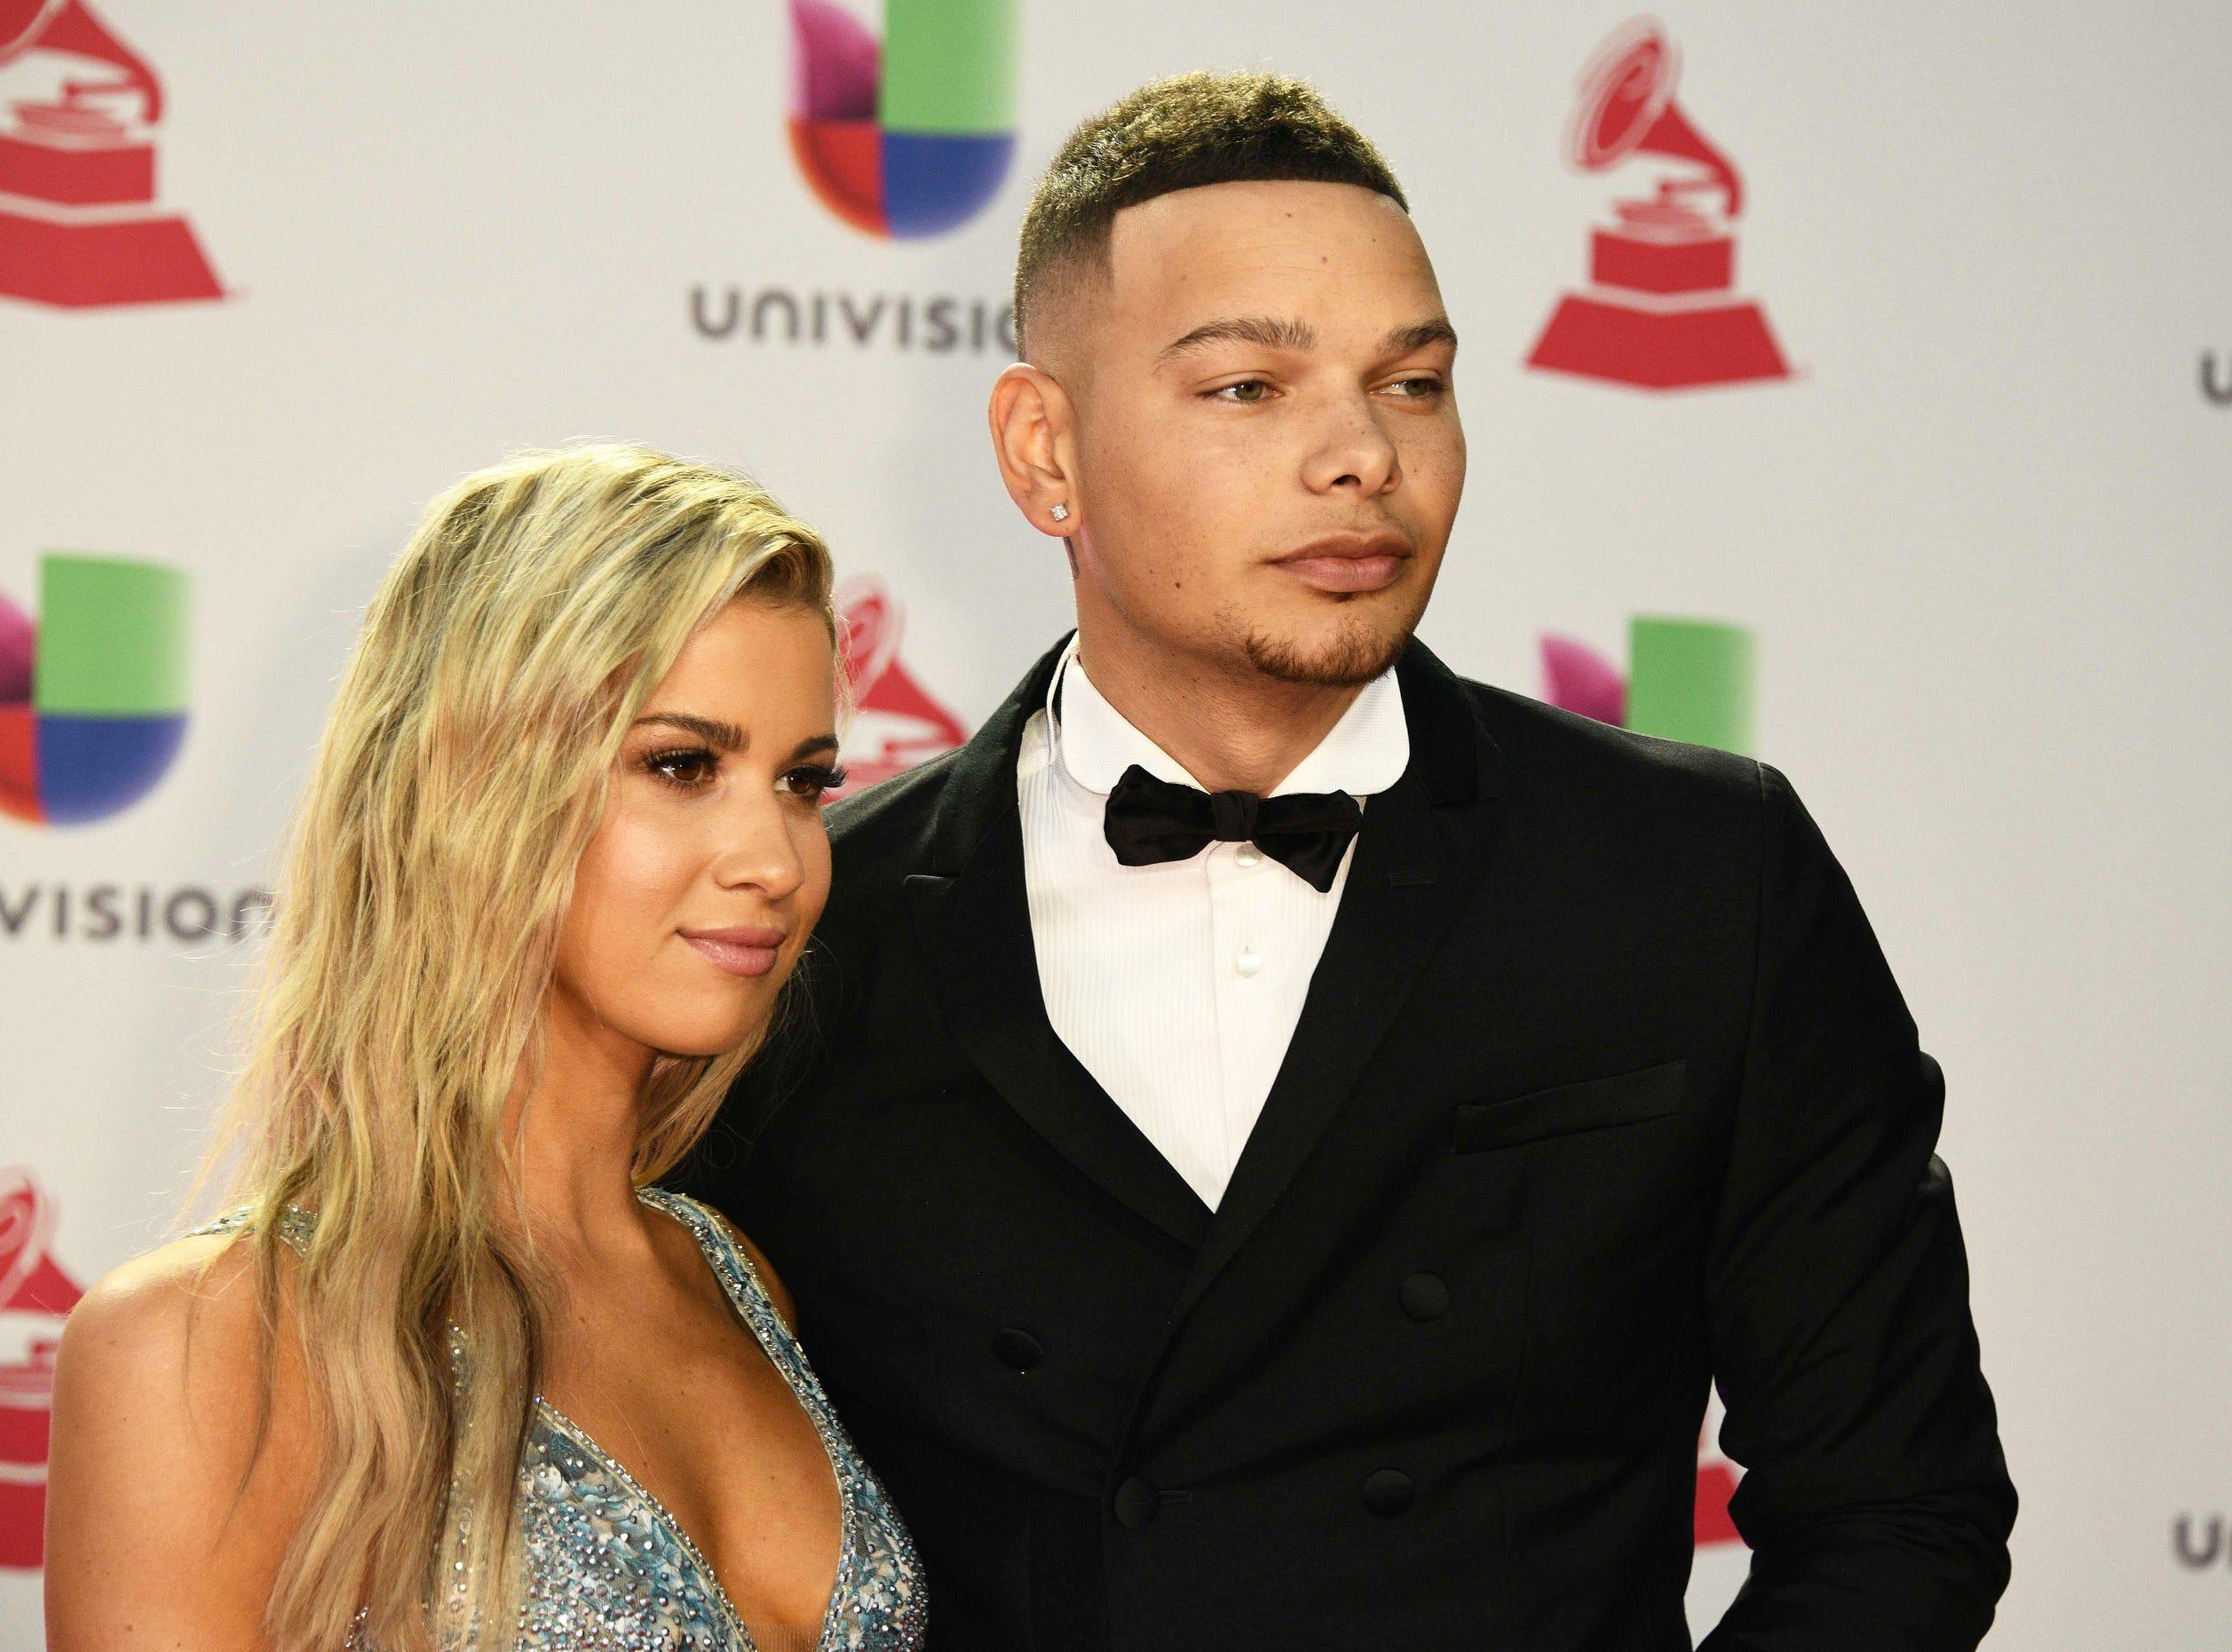 U.S. singer Kane Brown and wife Katelyn Jae